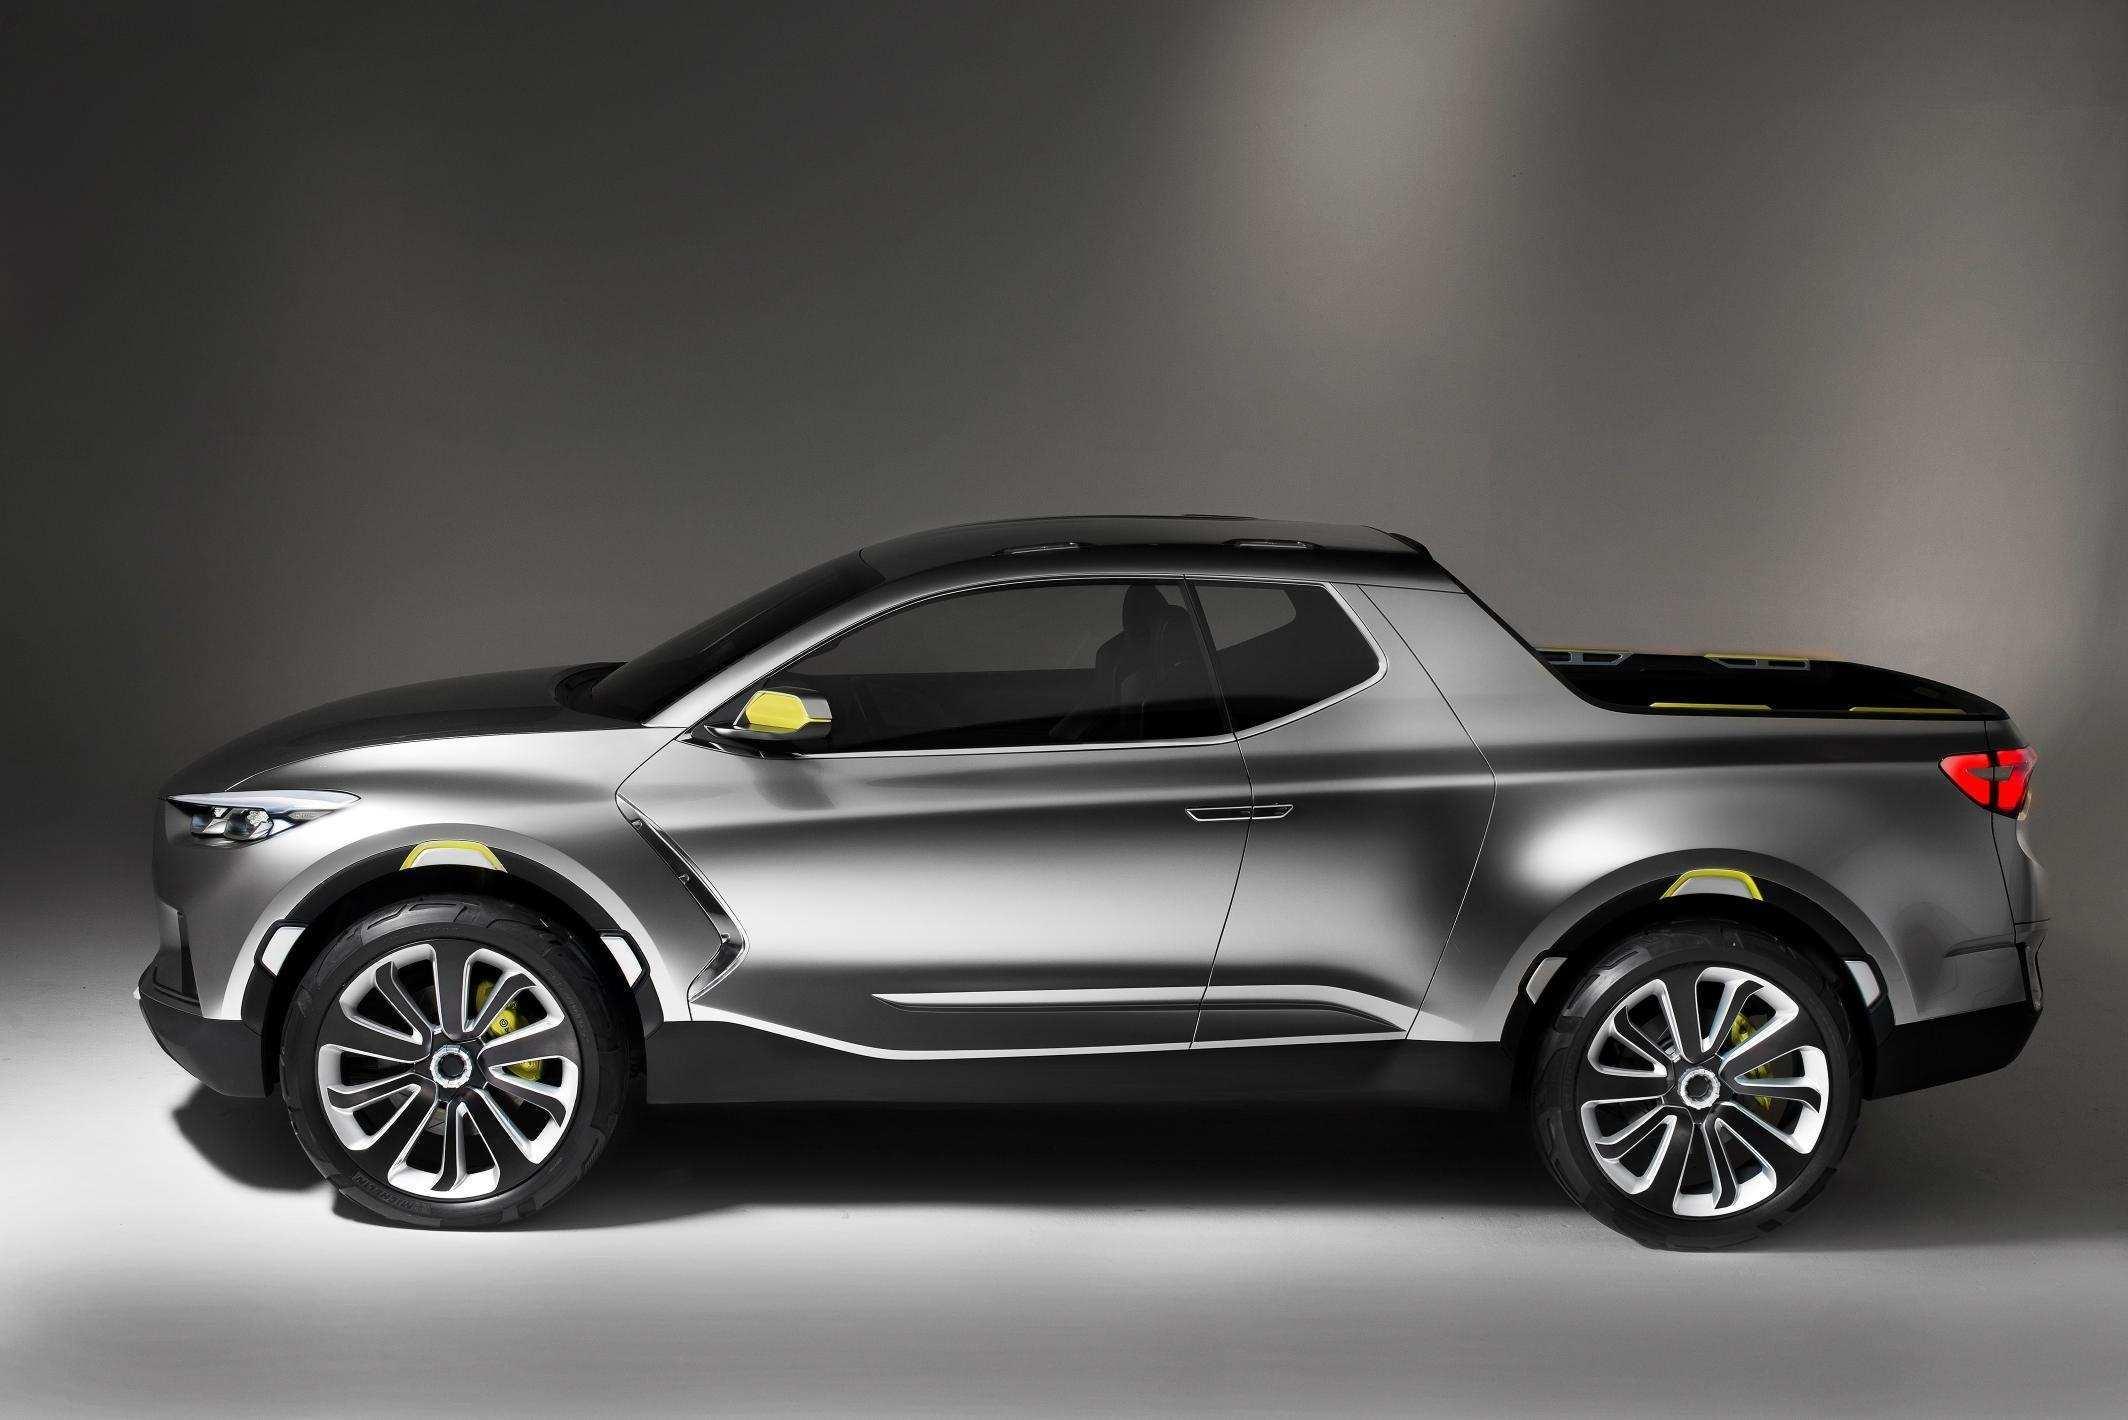 30 Concept of 2020 Subaru Pickup Release Date by 2020 Subaru Pickup